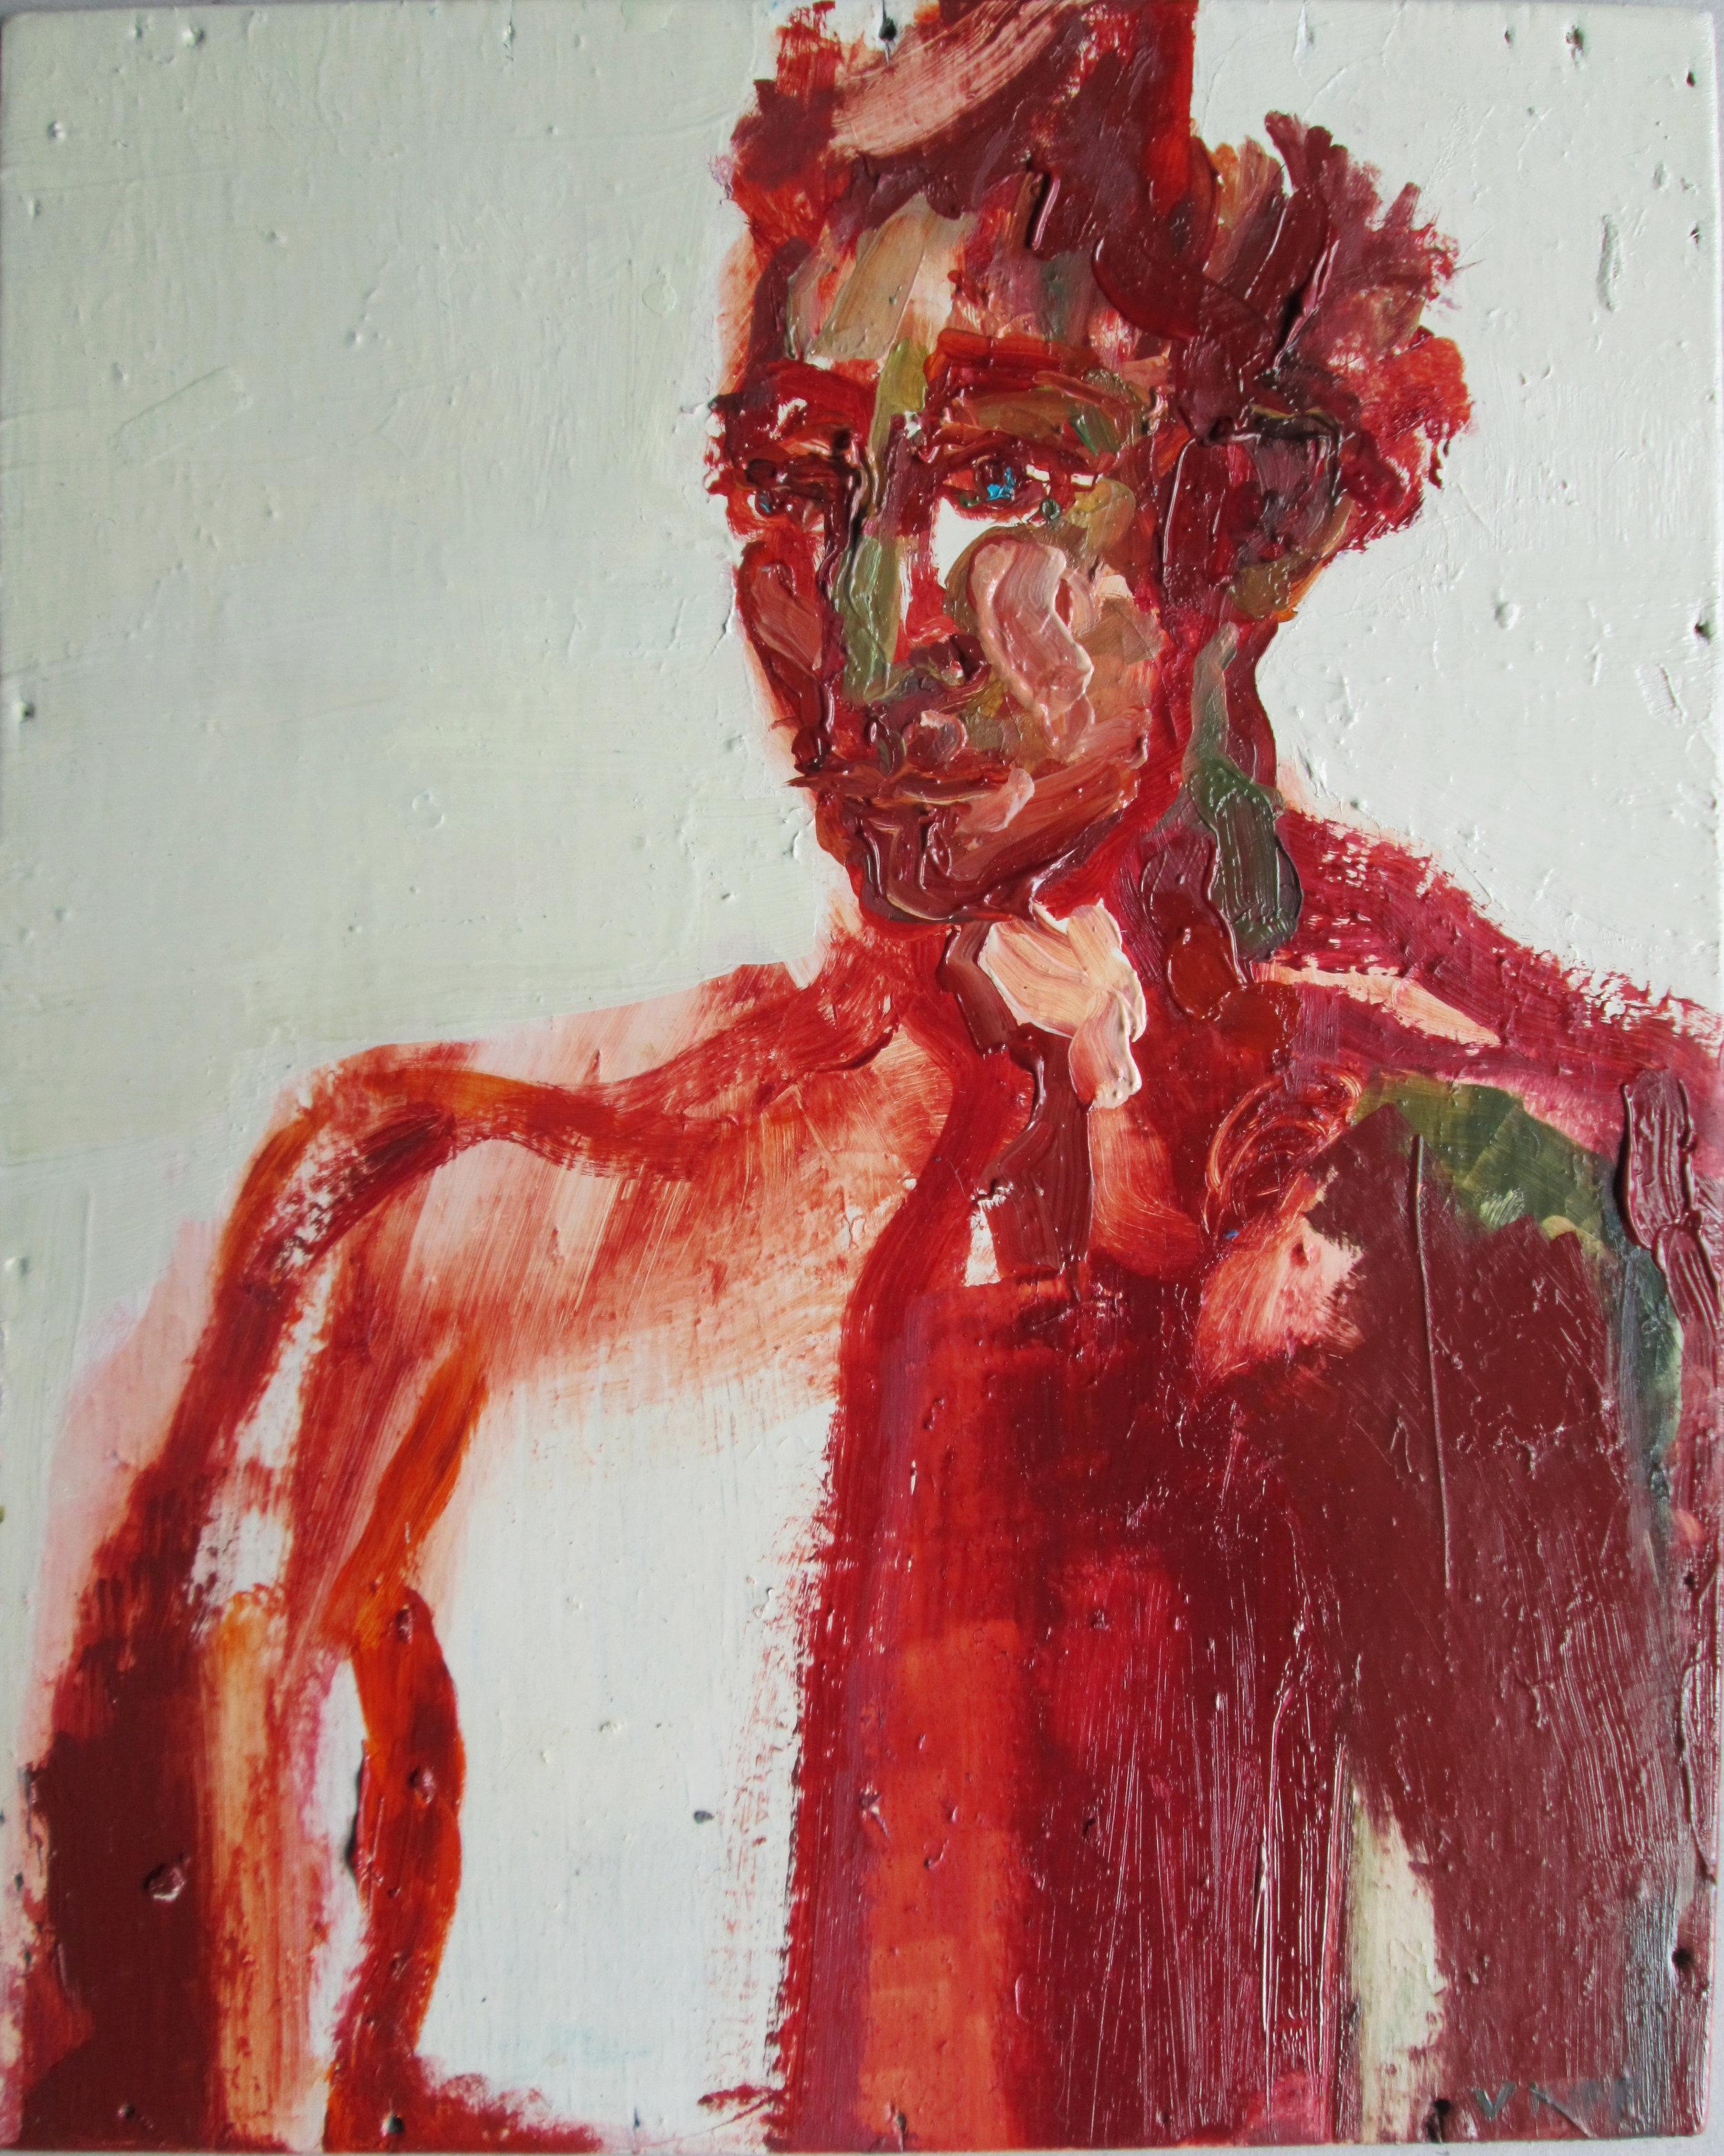 Artist: Victoria Kiff  Title: The Moss Vineyard  Size: 43 x 39 cm  Medium: Oil on wood panel  Price: £700